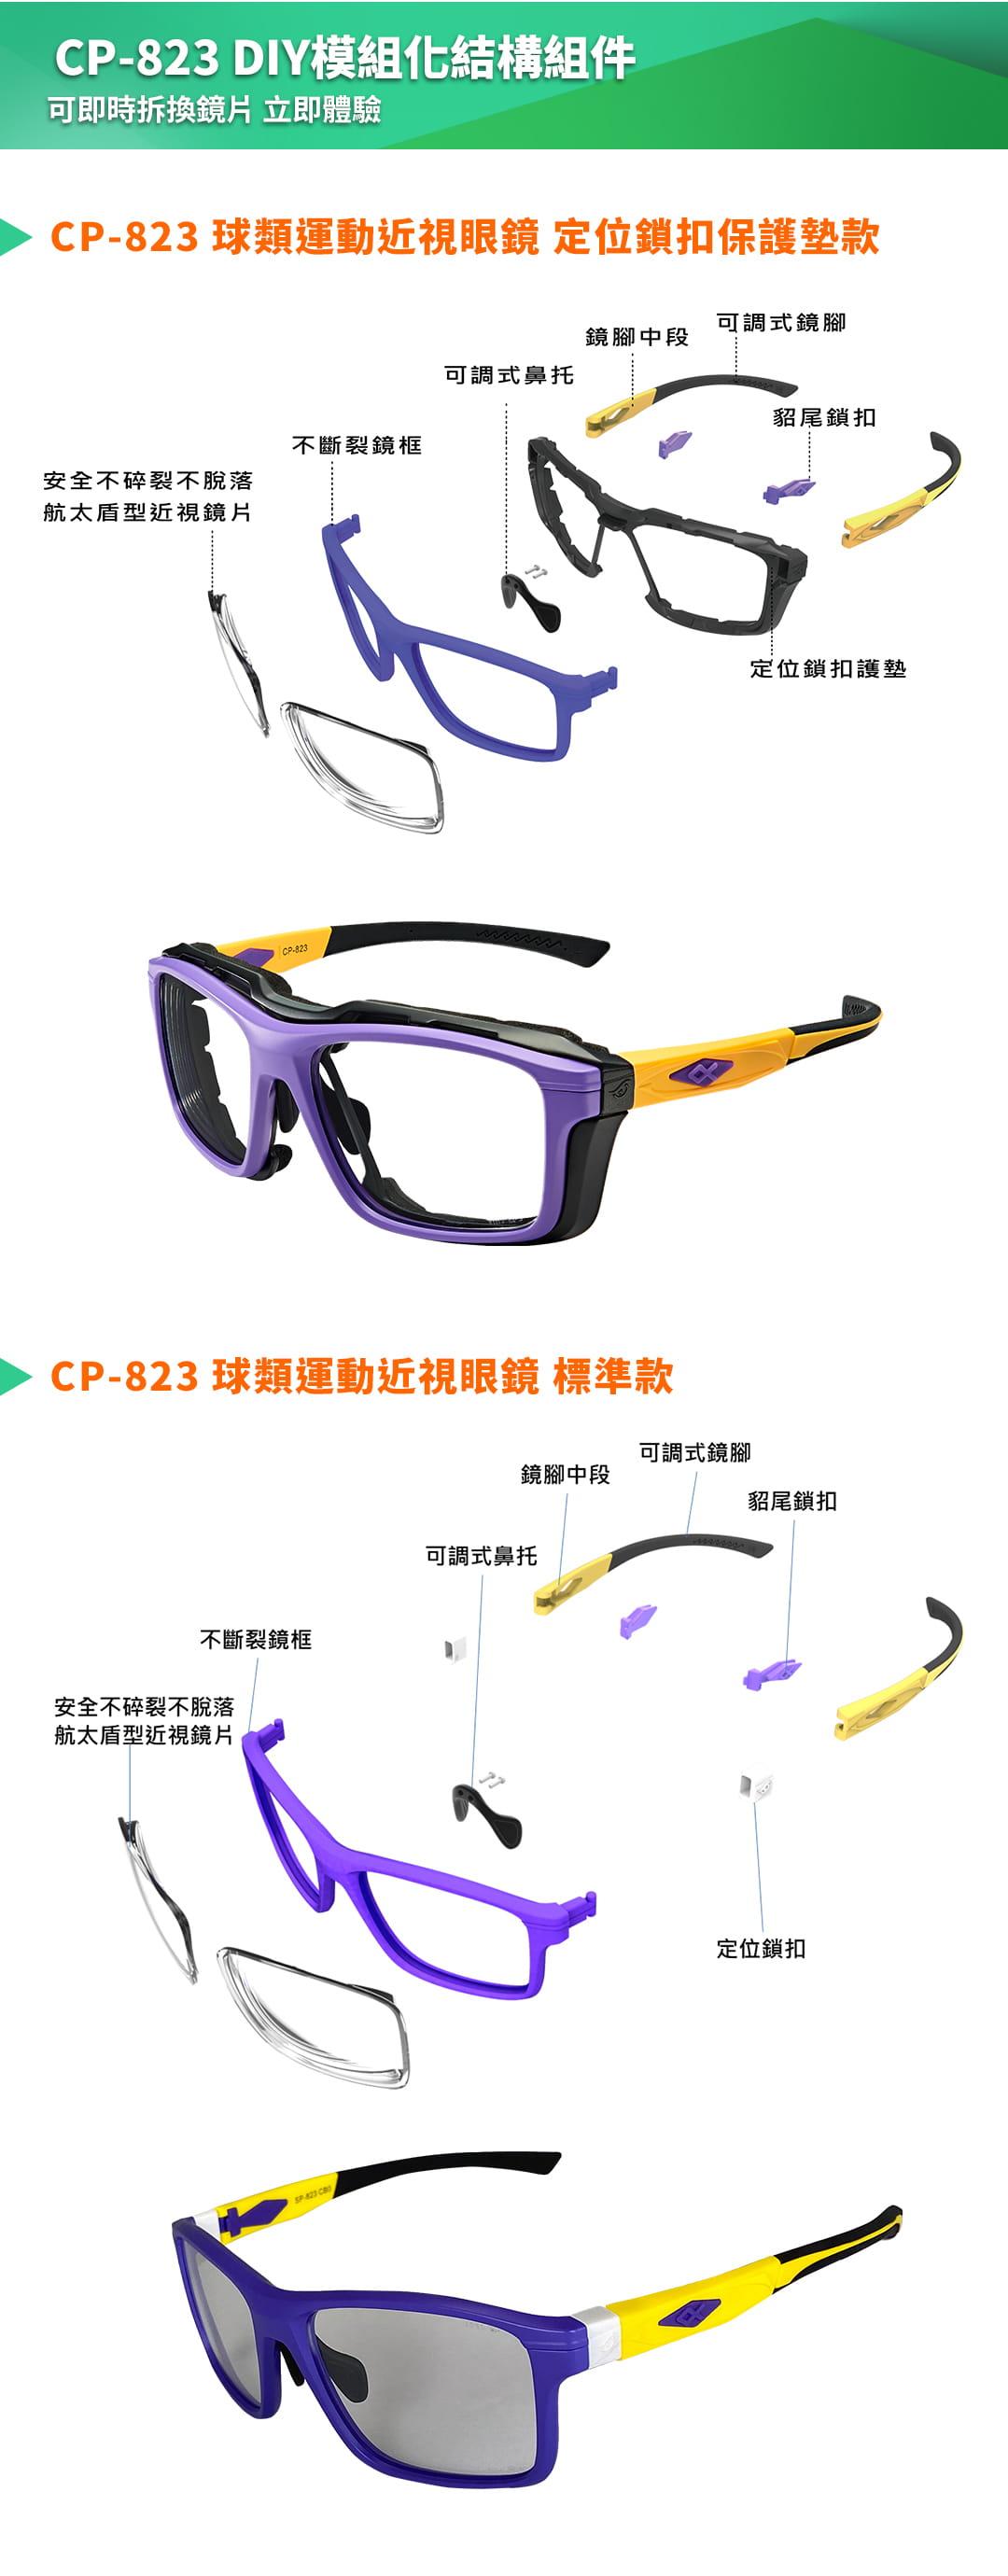 SABLE黑貂光學-專屬球類運動眼鏡CP-823(標準款-無保護墊)+SP-03(平光精緻鍍膜鏡片) 15